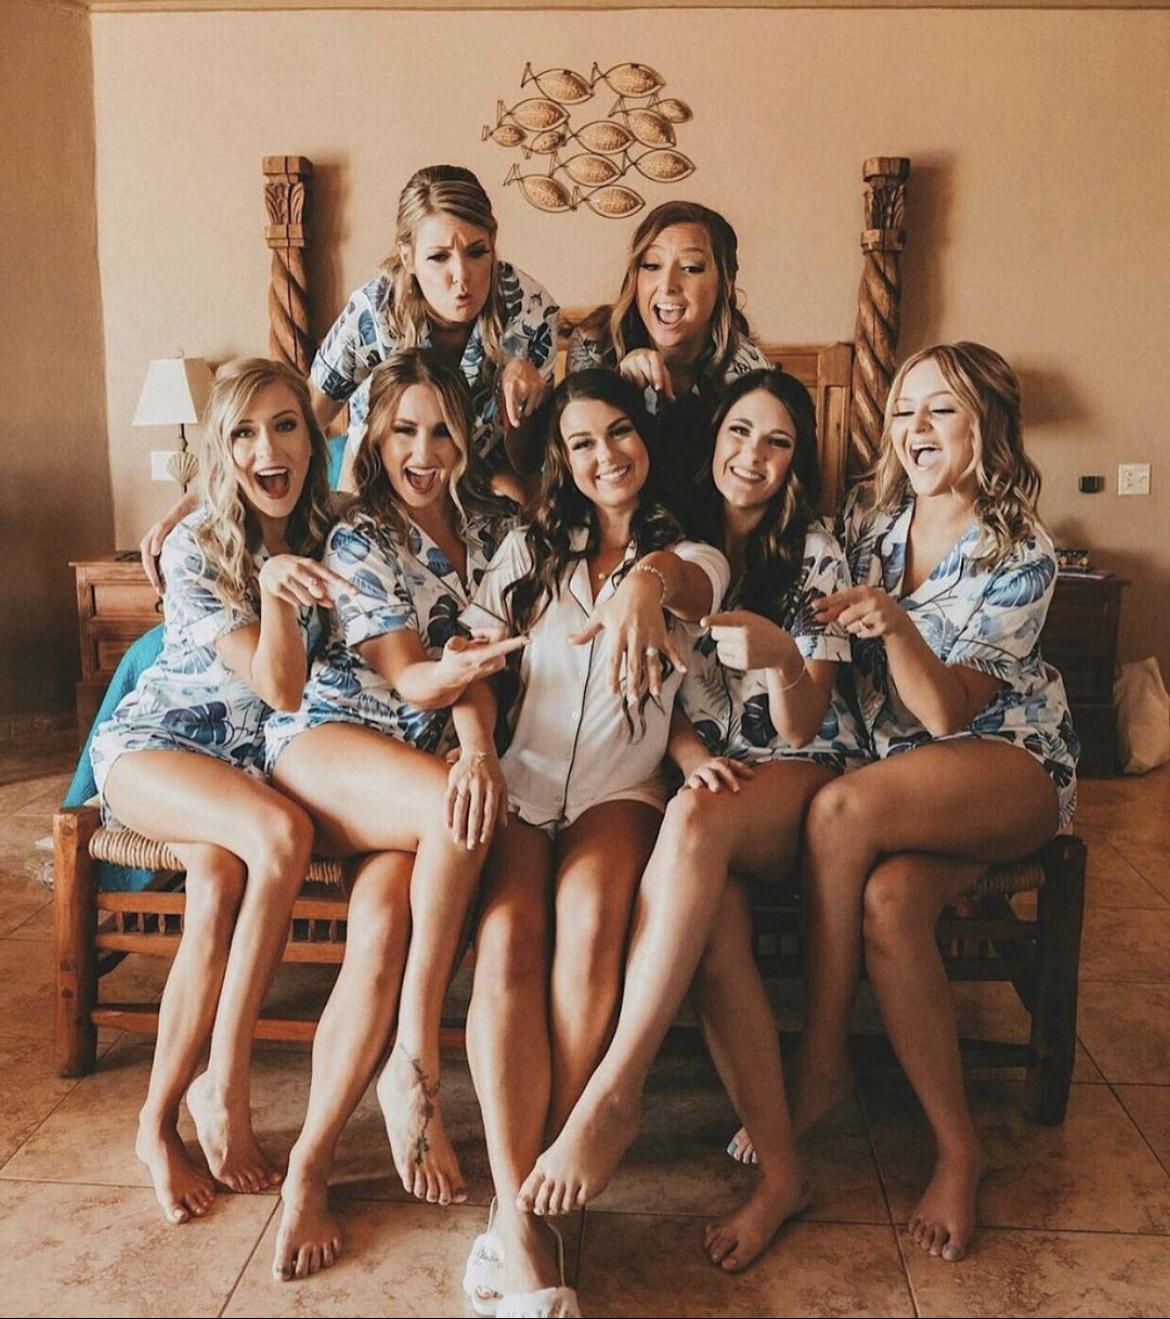 Bridal Spray Tans | Bronzed Humanity